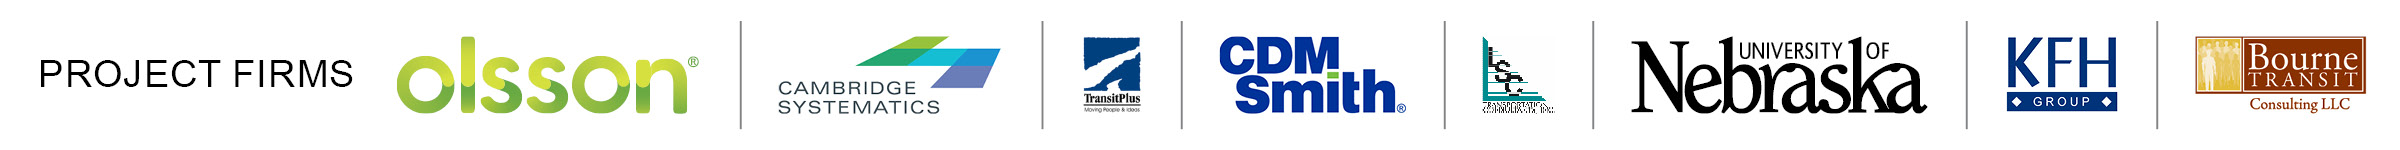 Mobility Management Project Firms: Olsson, Cambridge Systematics, TransitPlus, CDM Smith, LSC Transportation Consultants, Inc., University of Nebraska, KFH Group, Bourne Transit Consulting LLC